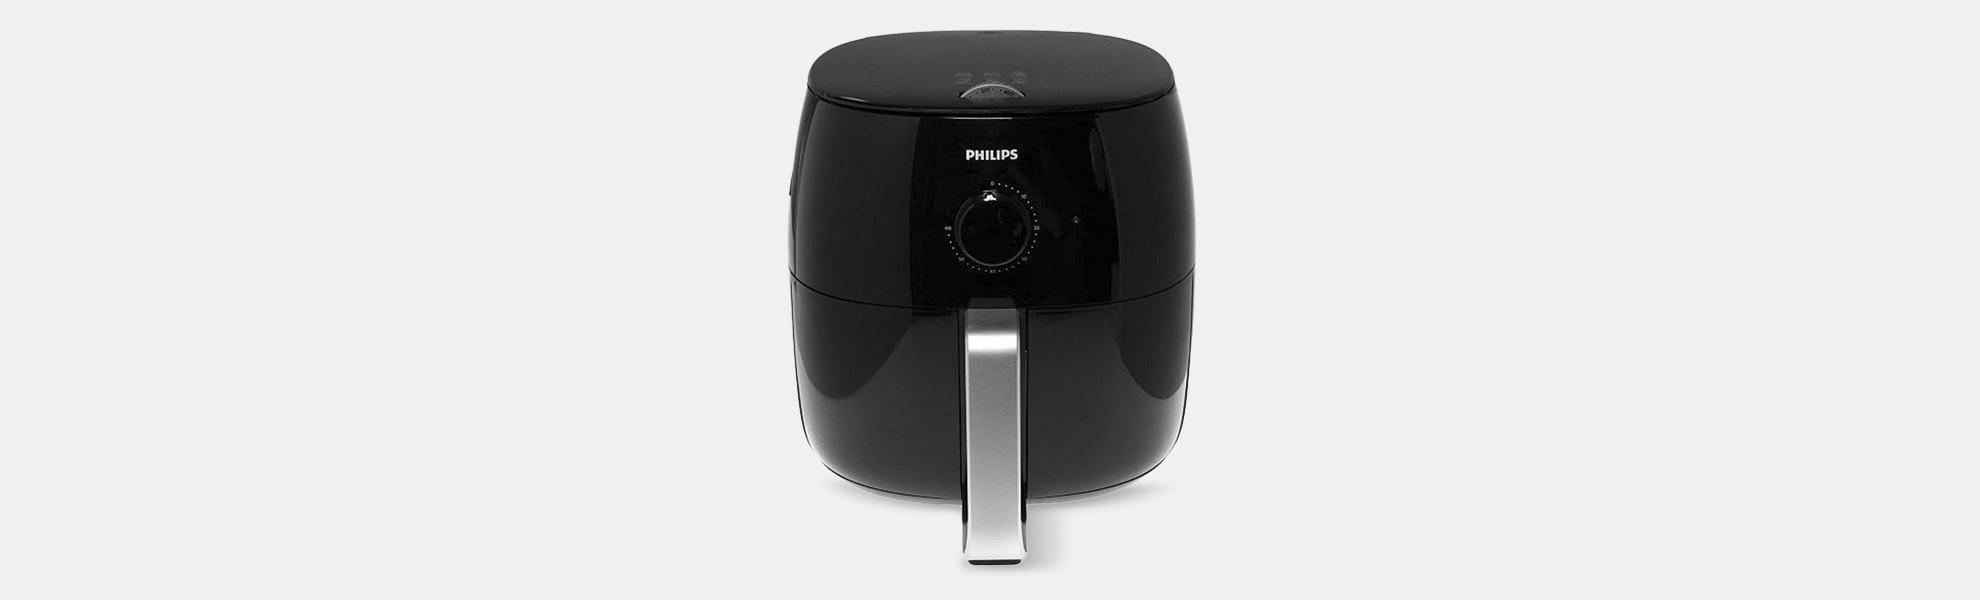 Philips Avance XXL Twin Turbostar Air Fryer